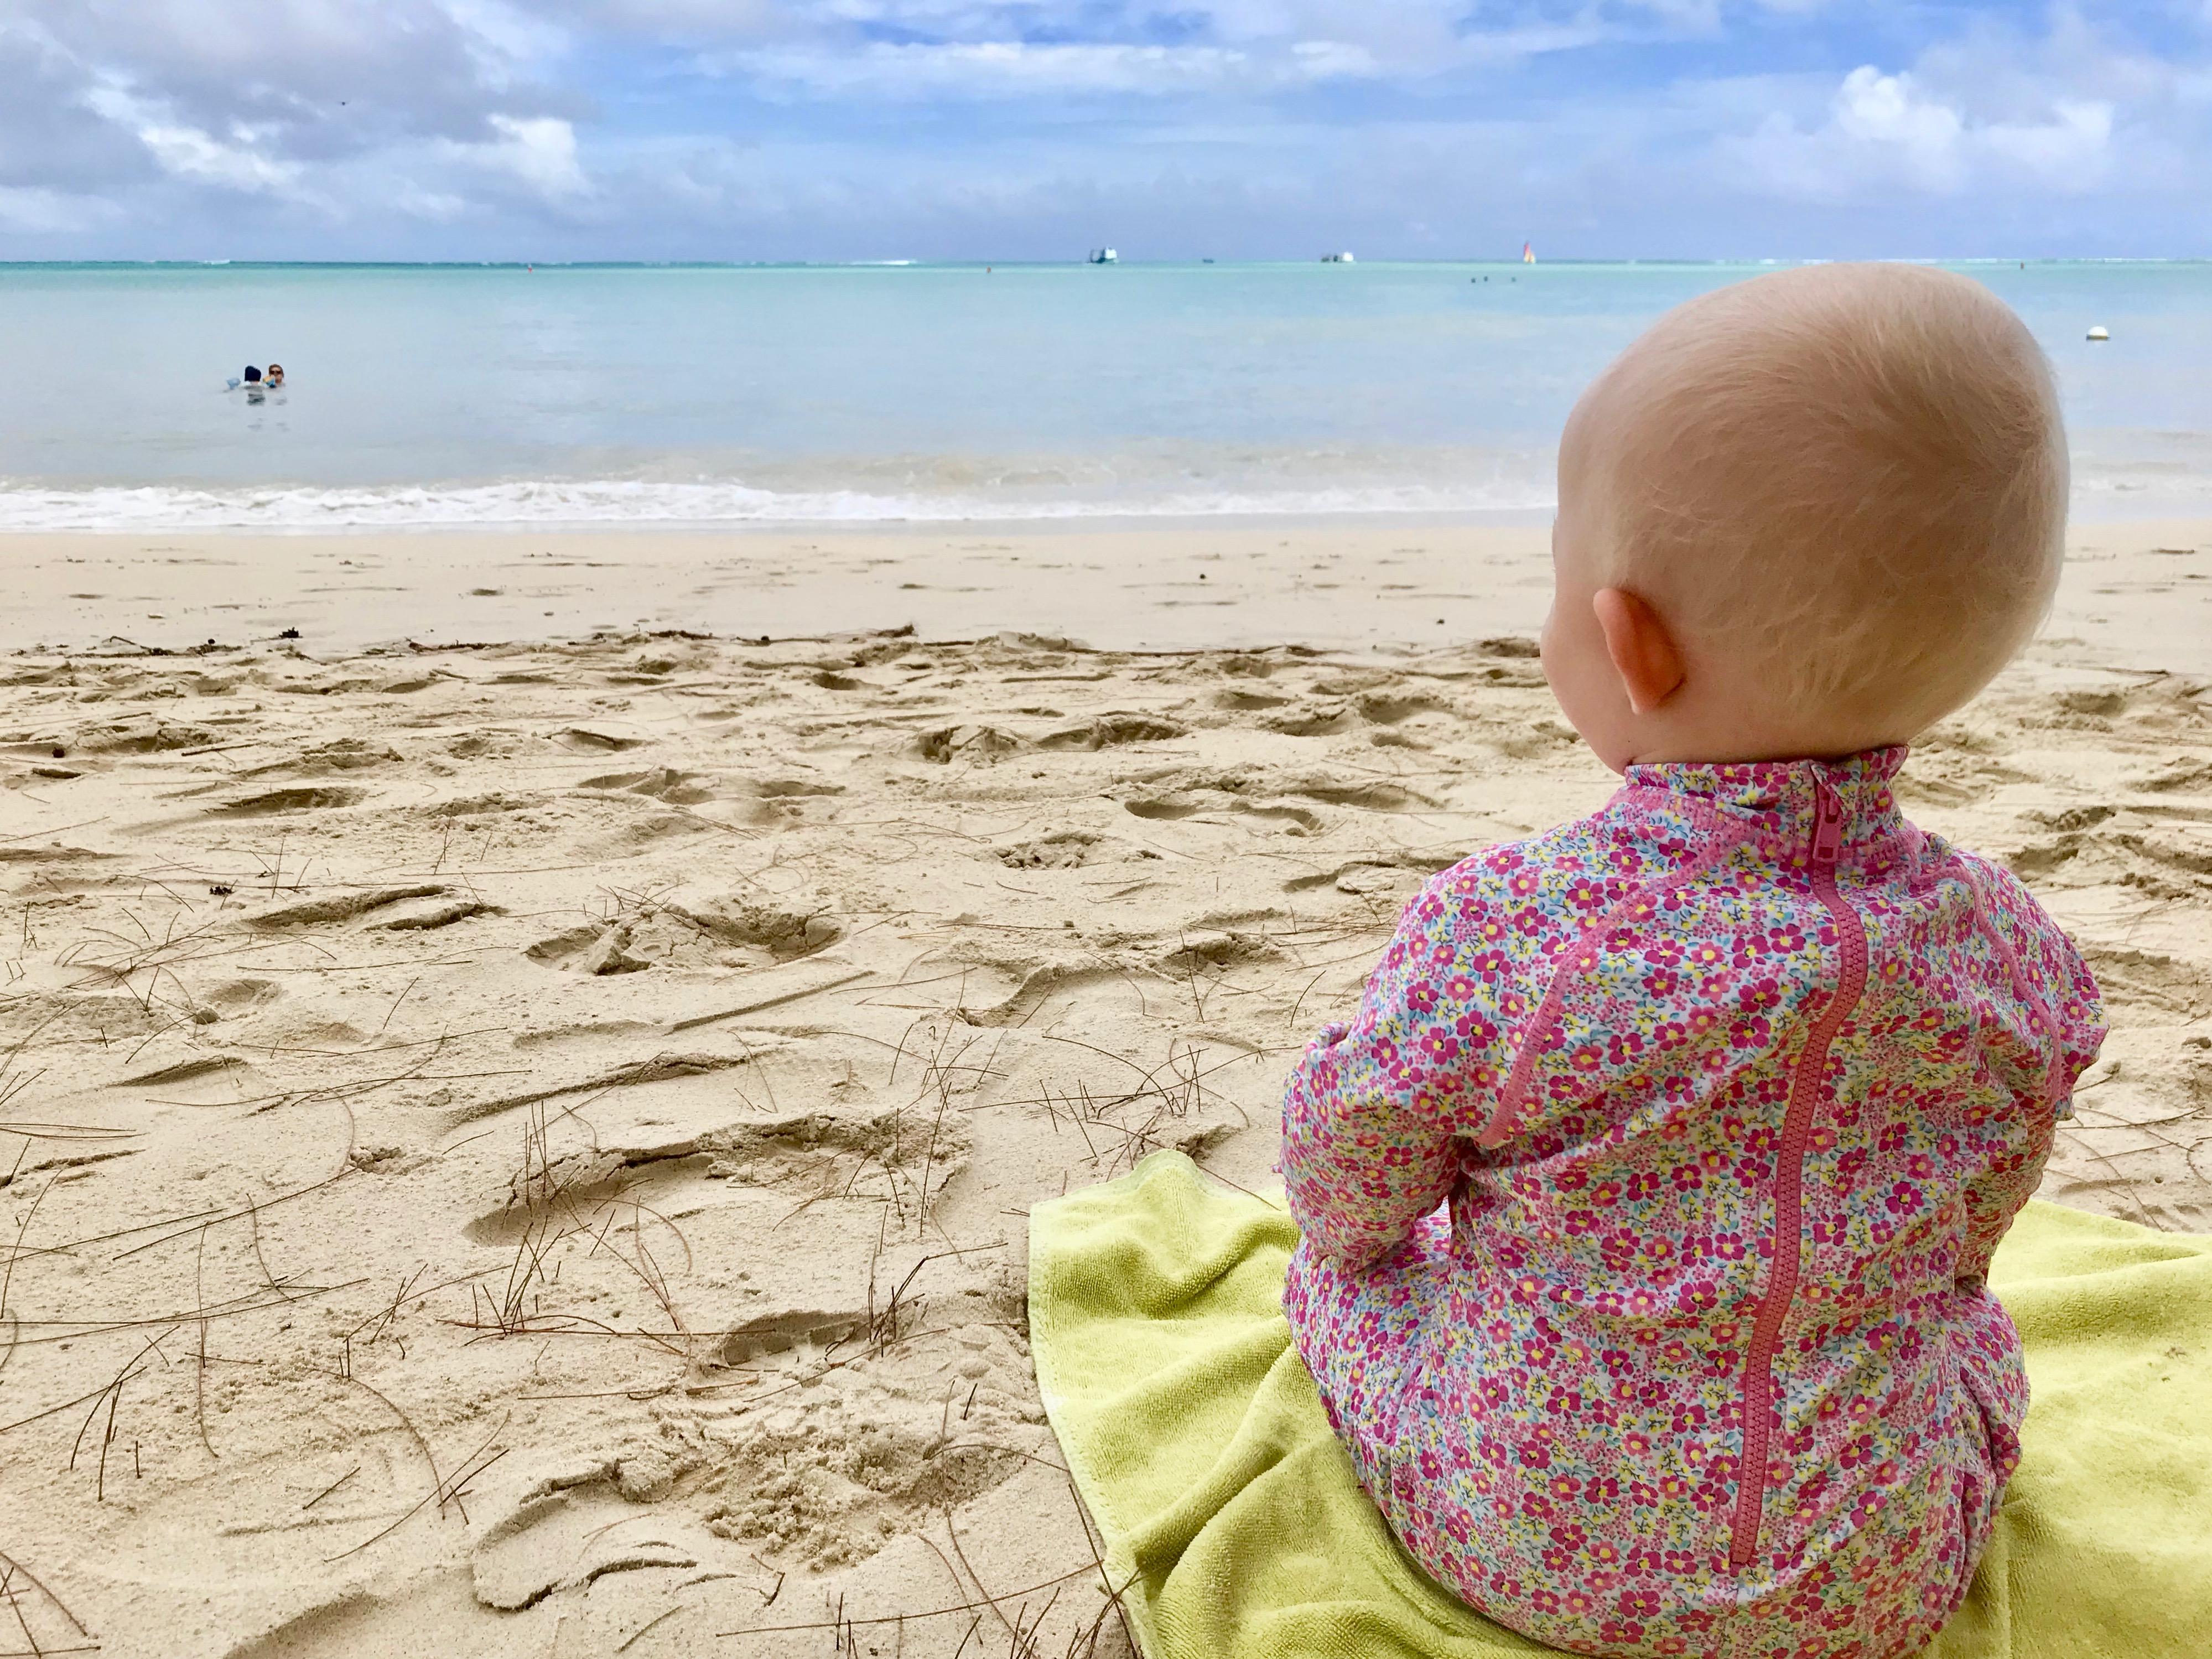 Children on Mauritius Beach